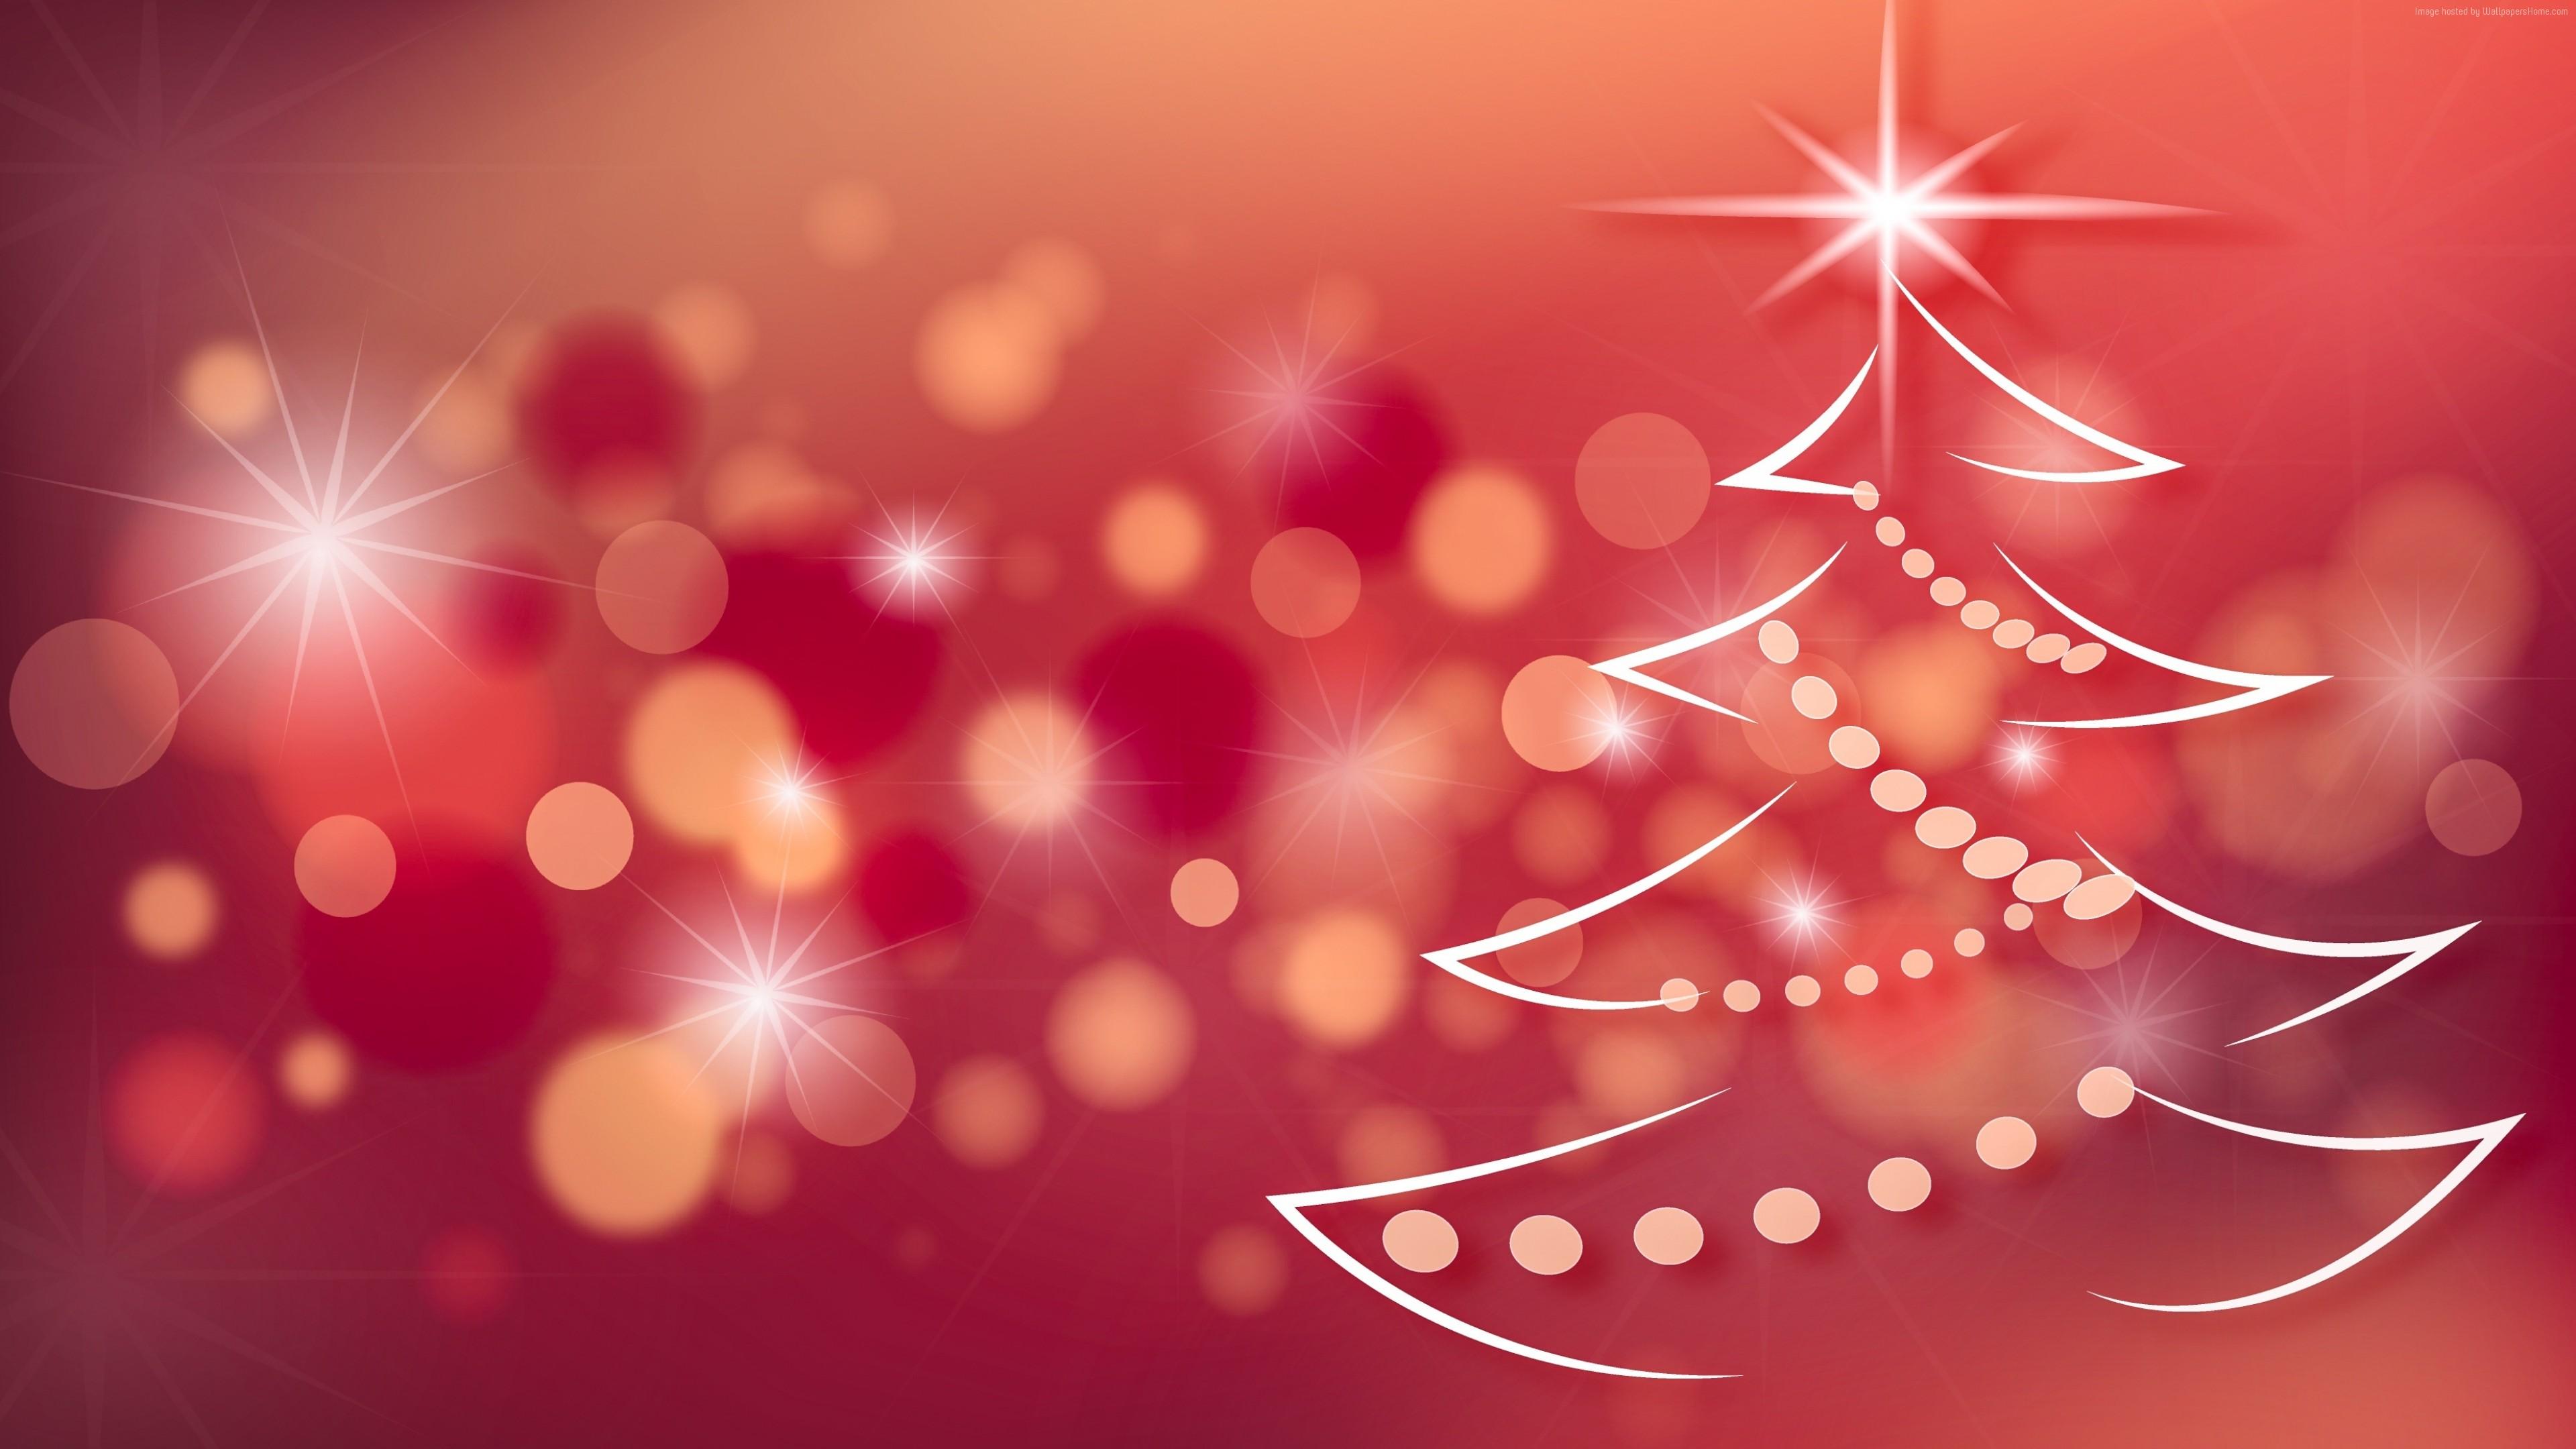 wallpaper christmas, new year, fir-tree, , 4k, holidays 4k